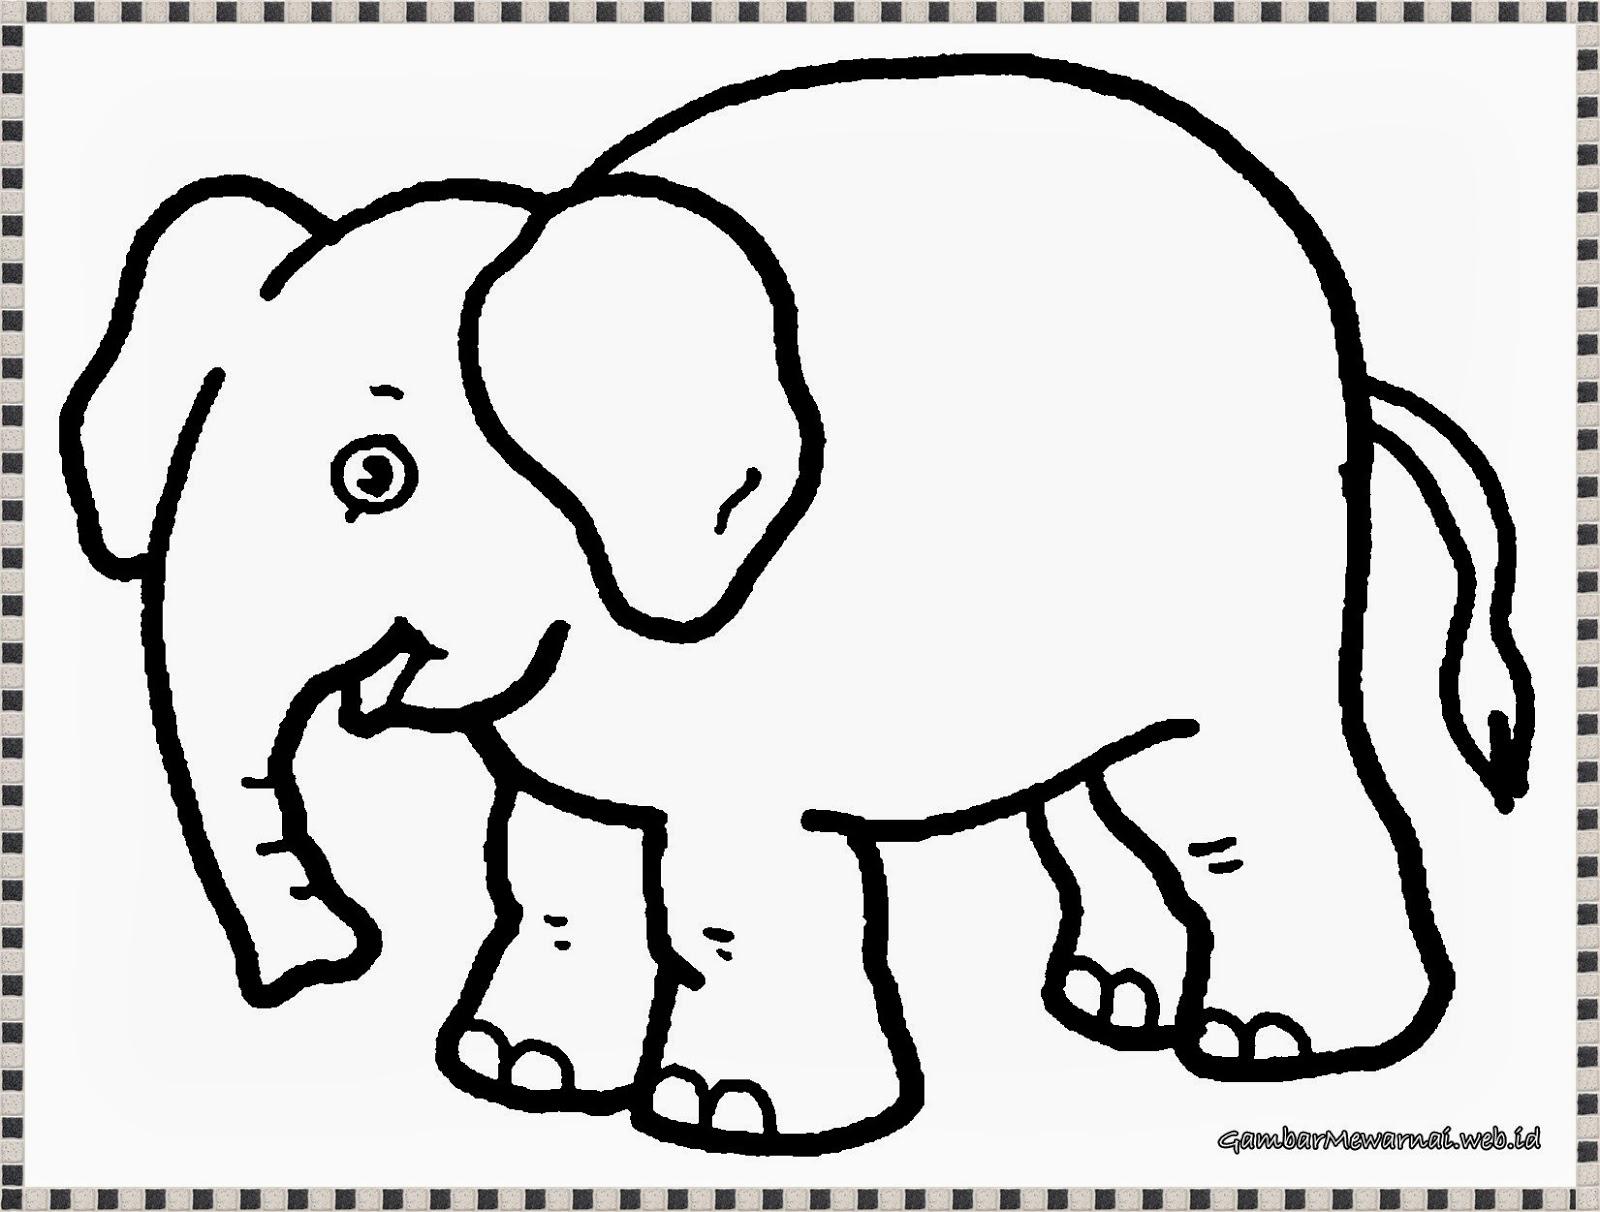 Gambar Ilustrasi Hewan Gajah